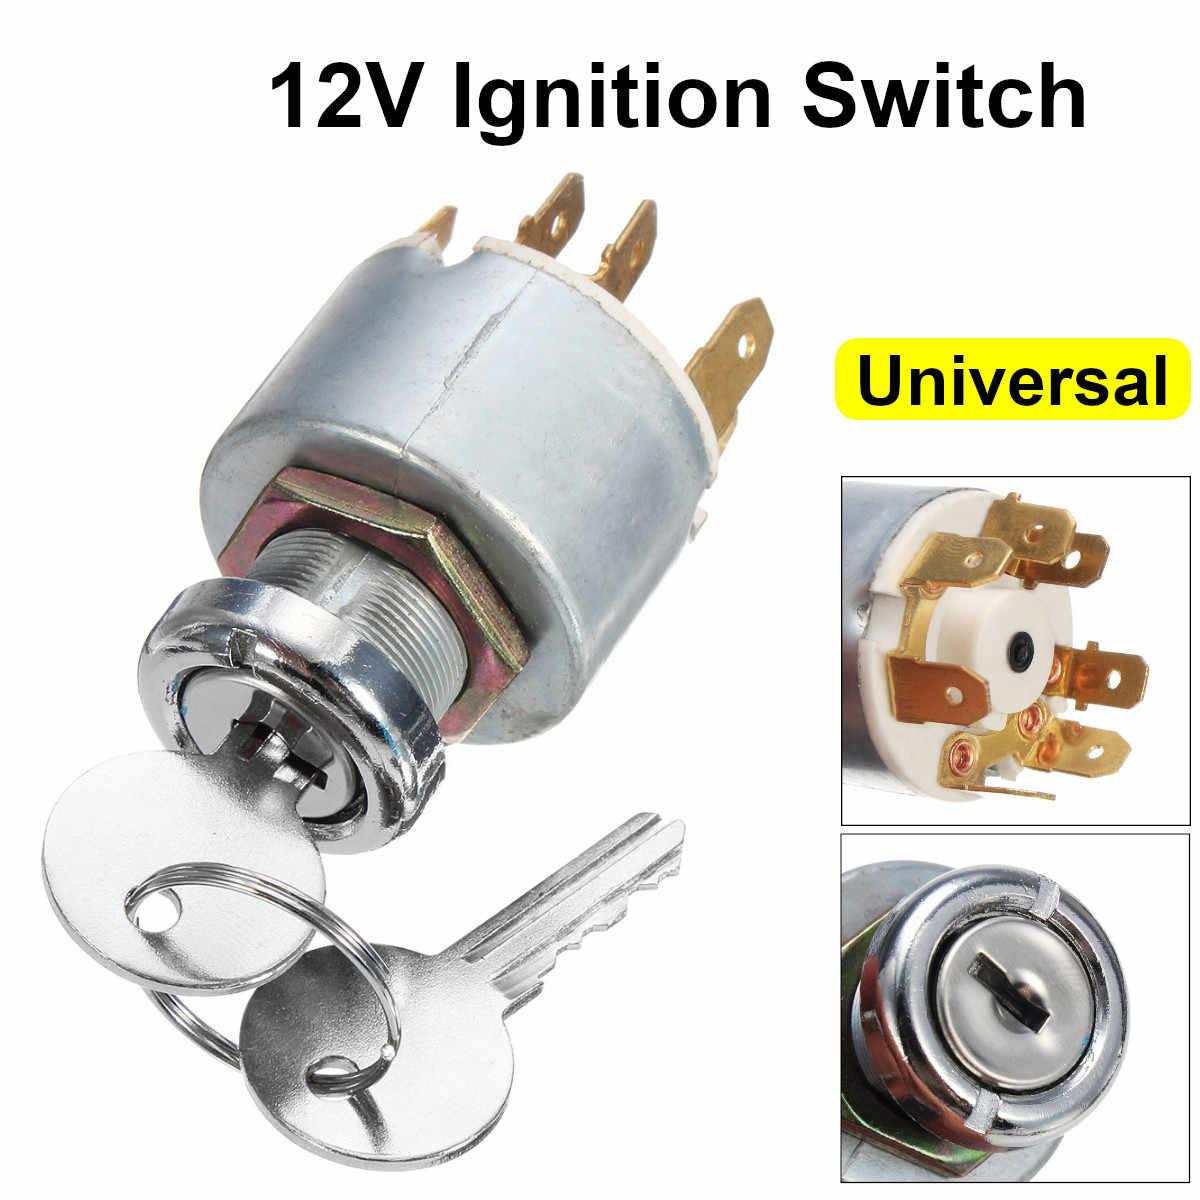 12v 4 Position Universal Car Boat Motorcycle Ignition Lock Cylinder Switch Control W 2 Keys For Lucas Spb501 Car Key Aliexpress